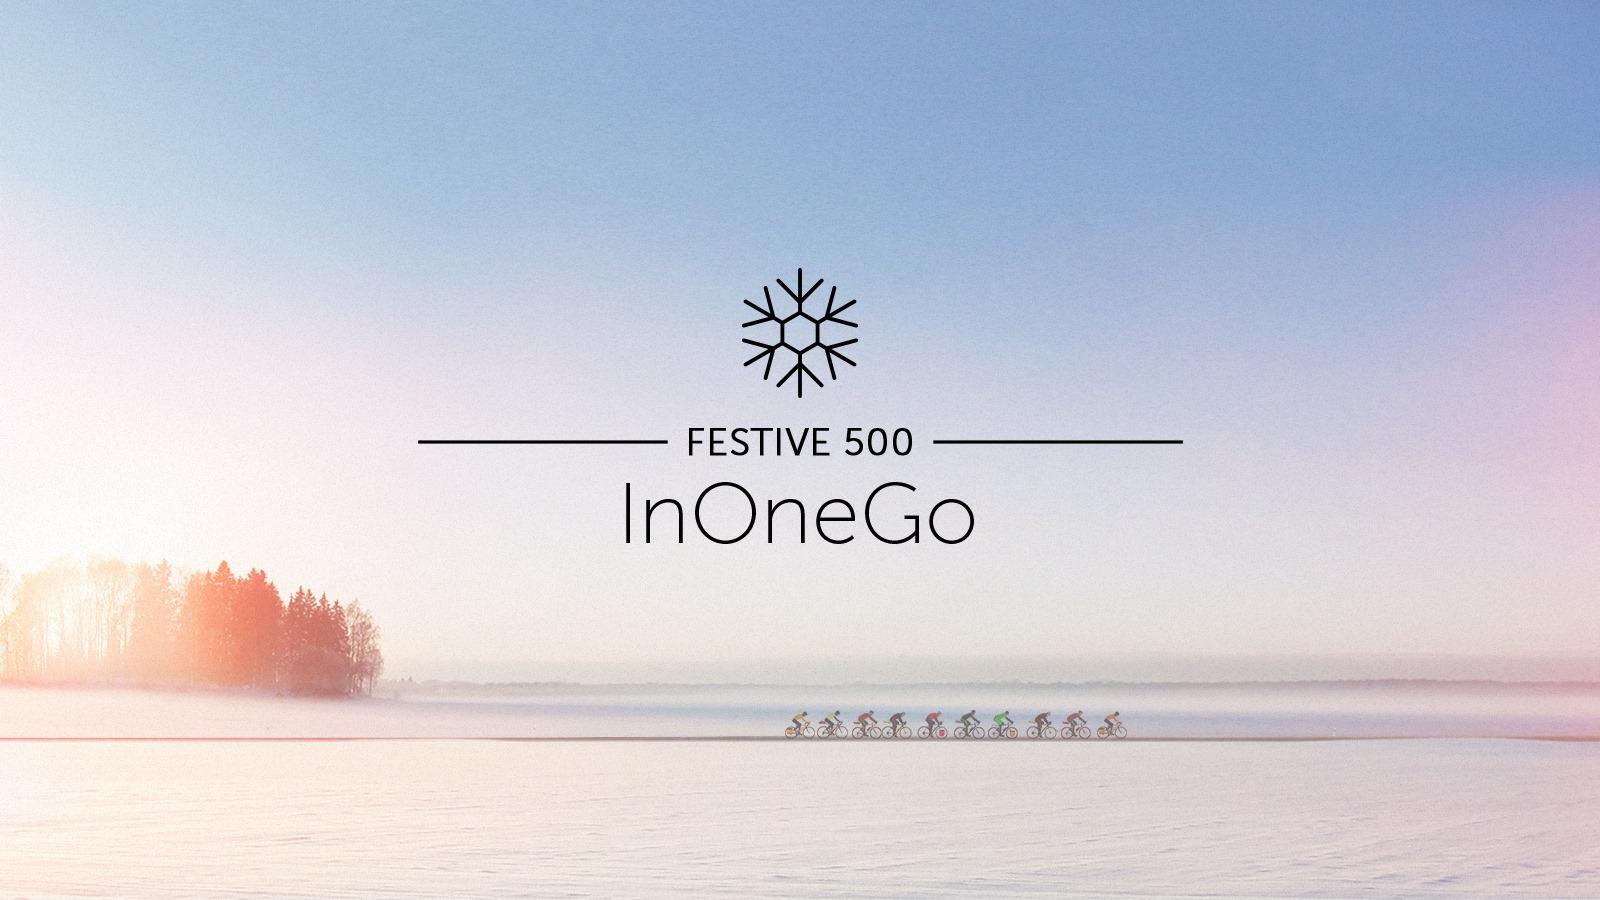 Festive 500